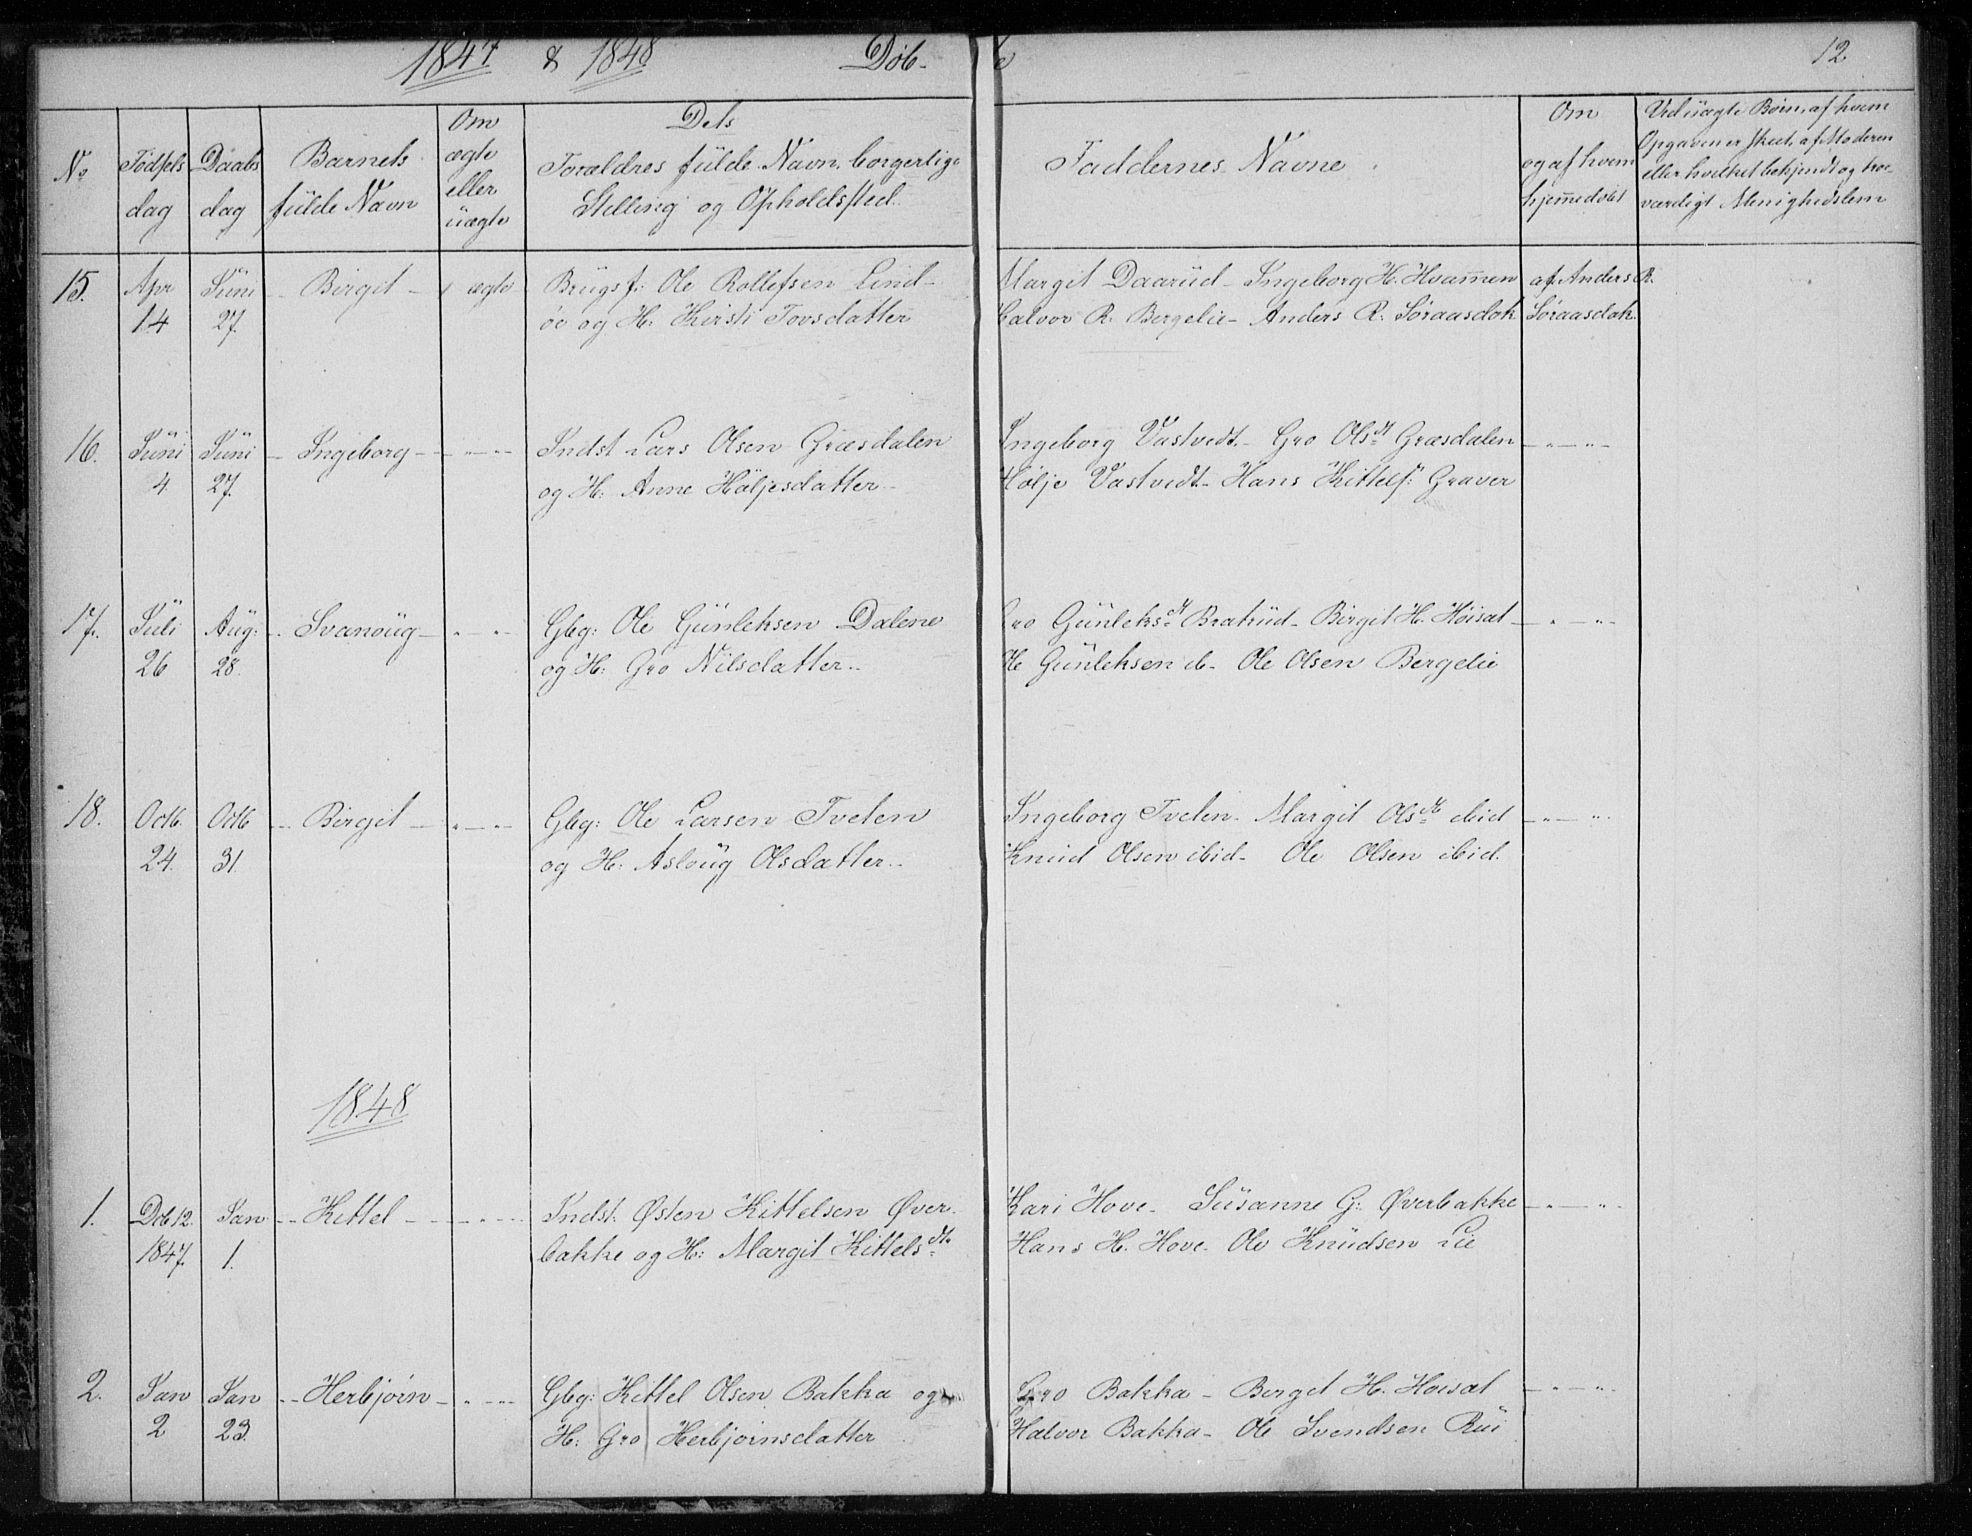 SAKO, Gransherad kirkebøker, F/Fb/L0003: Ministerialbok nr. II 3, 1844-1859, s. 12